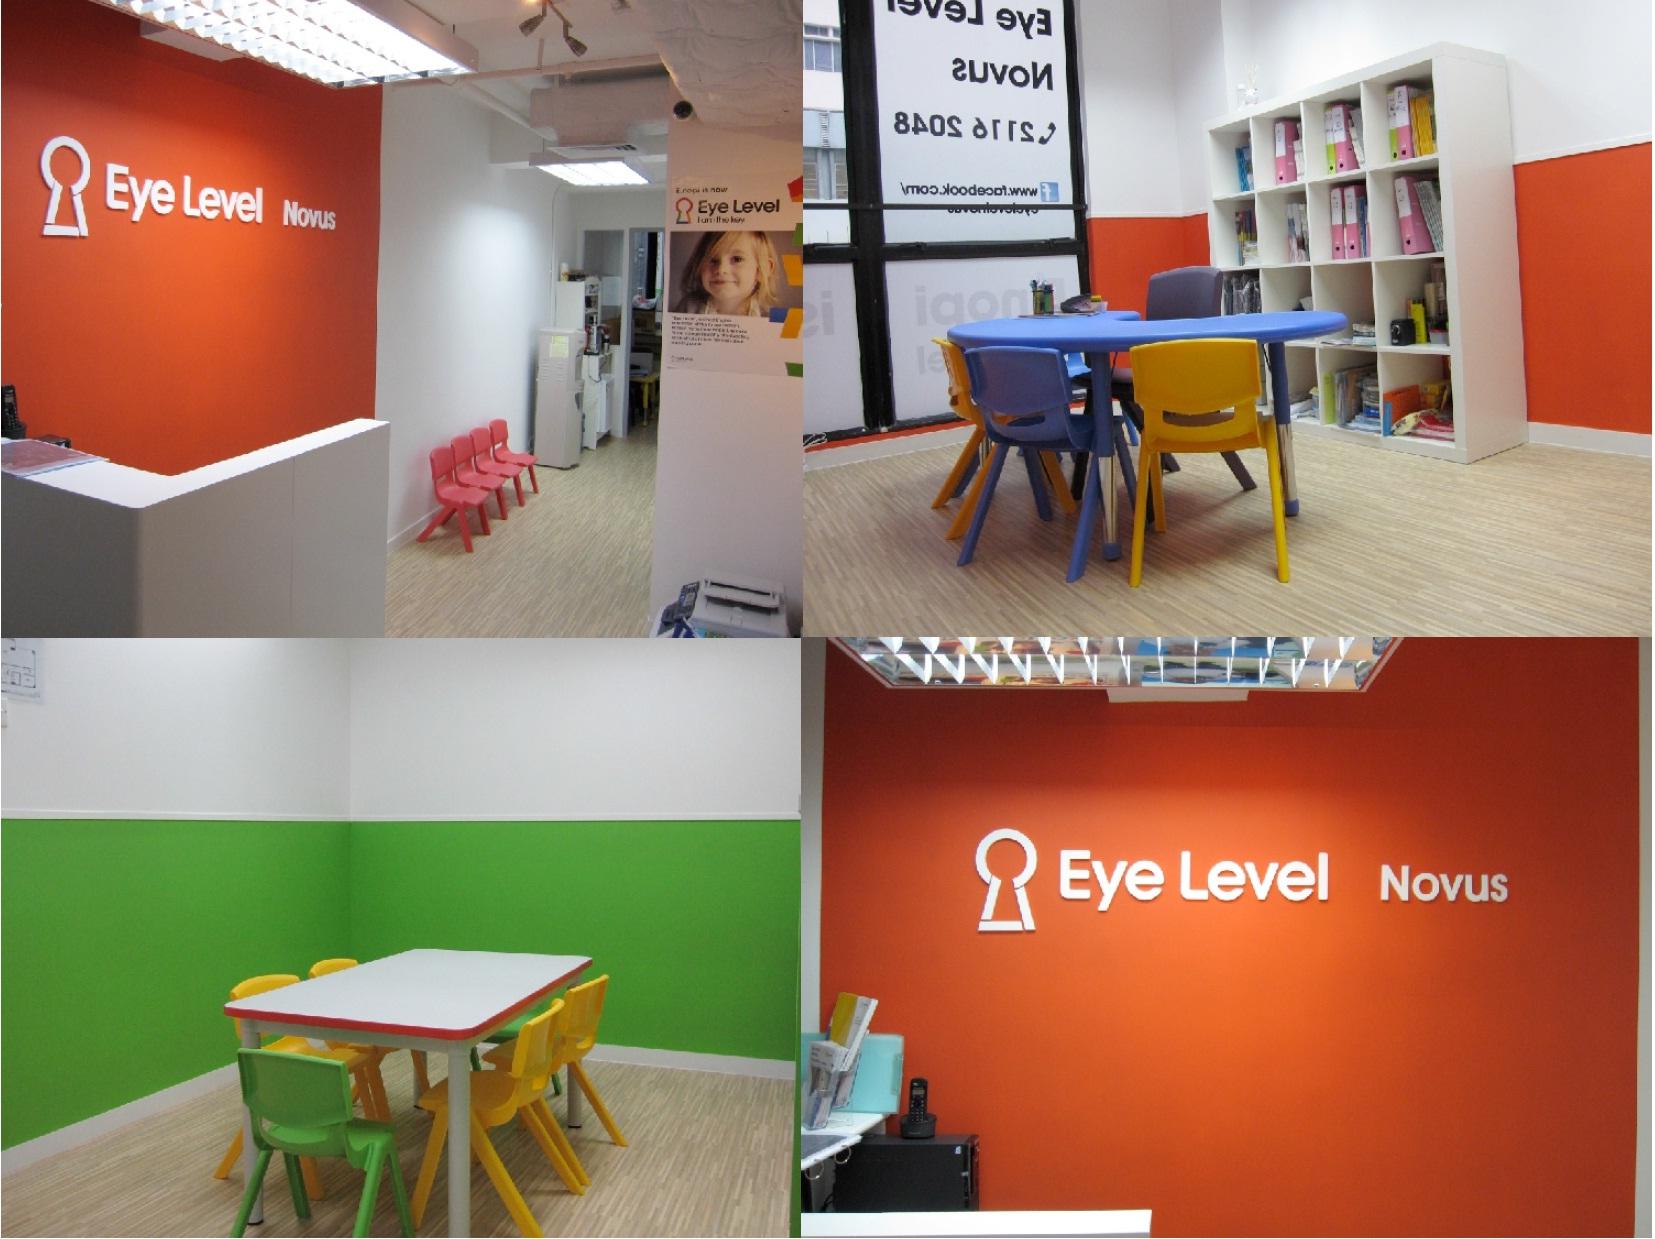 New Center-Eye Level Novus | Eye Level Global English